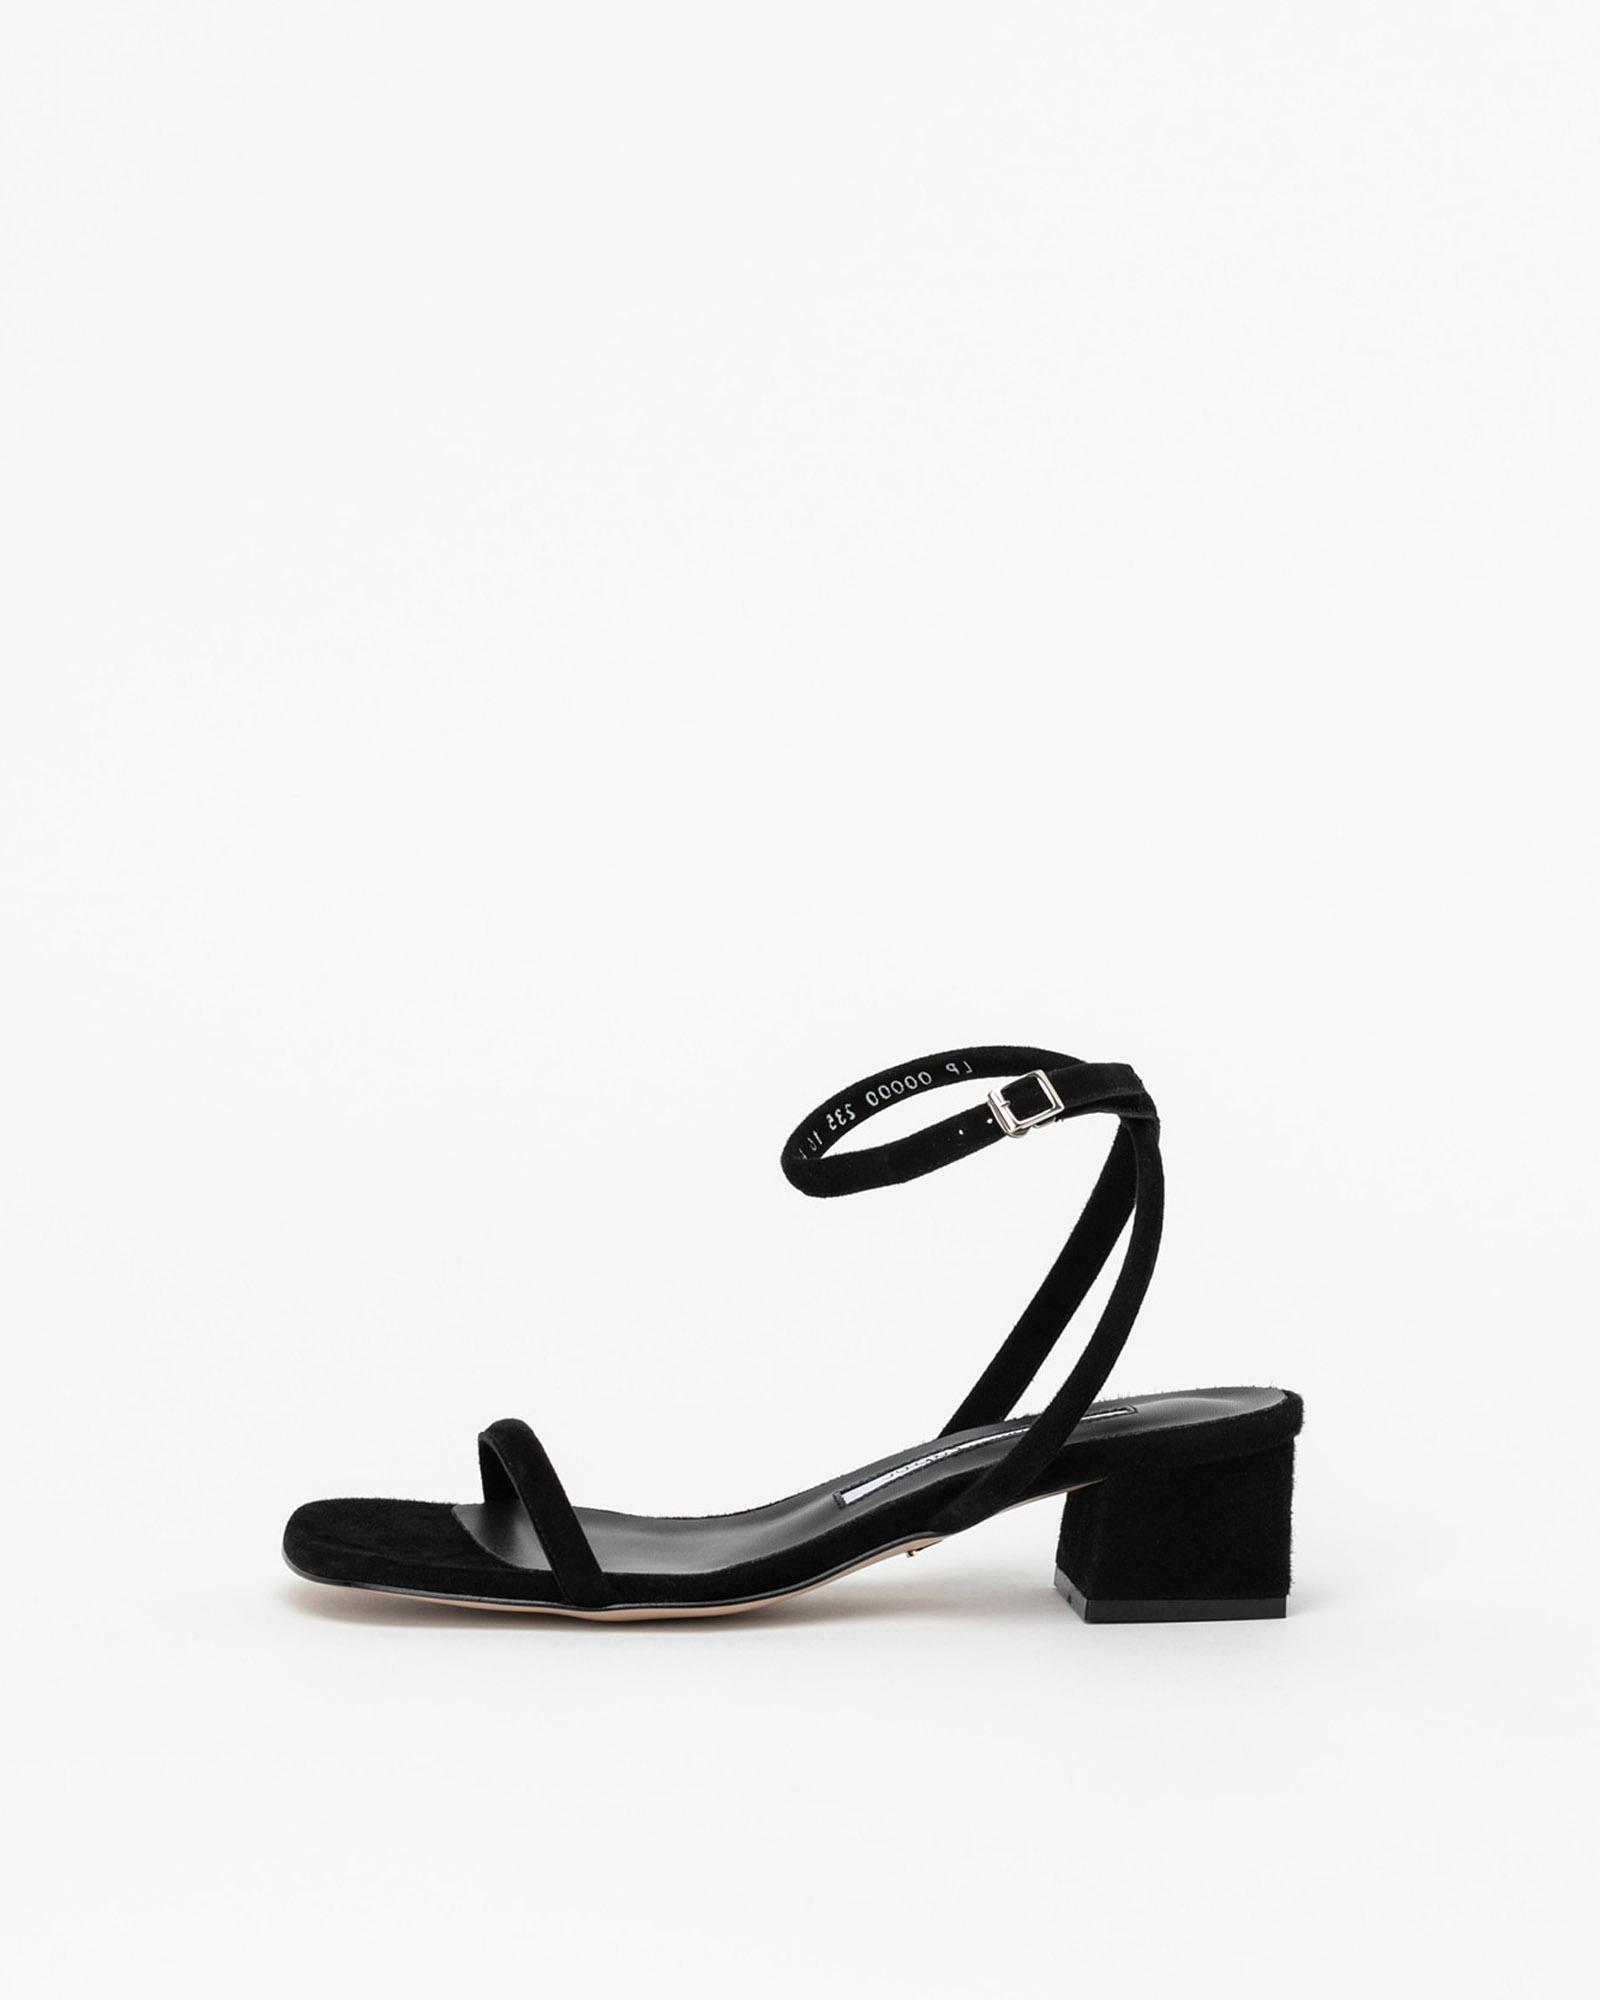 Audette Strap Sandals in Black Suede